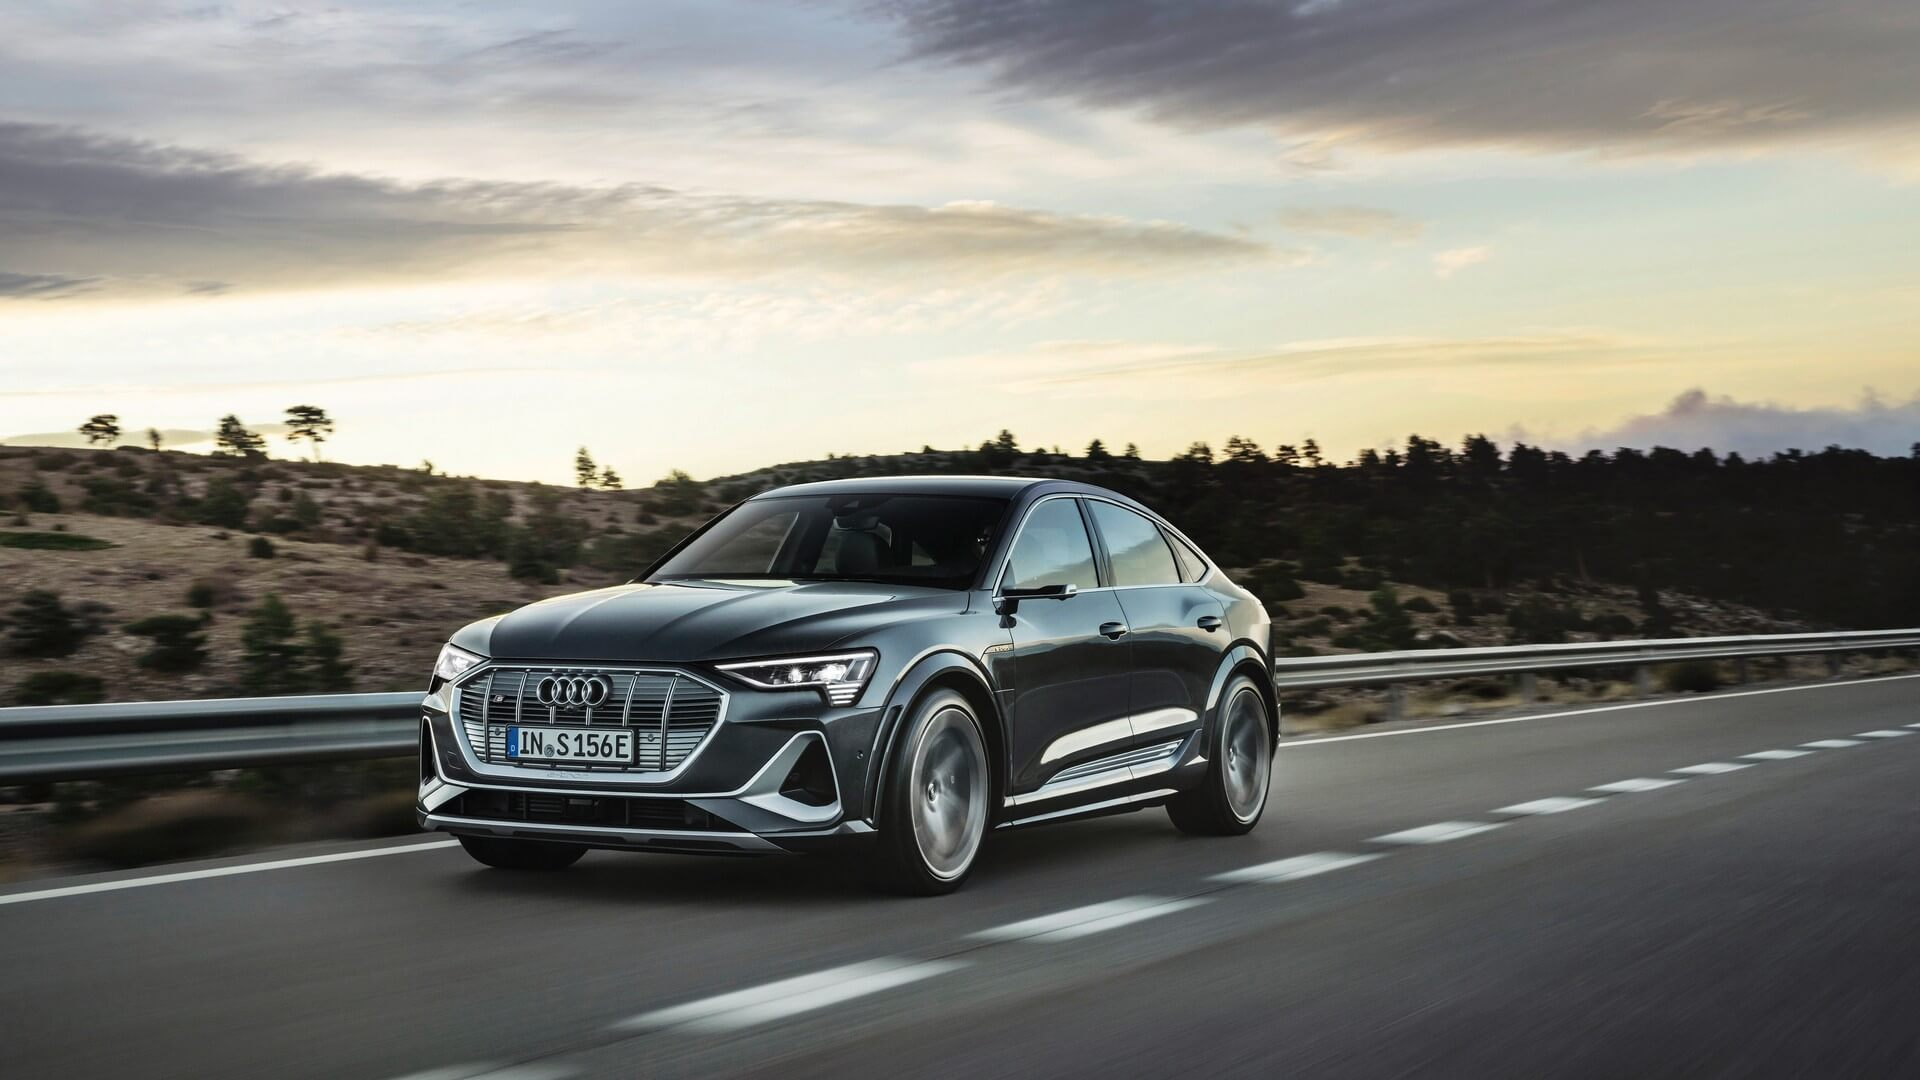 Audi-E-Tron-S-and-E-Tron-S-Sportback-2020-43